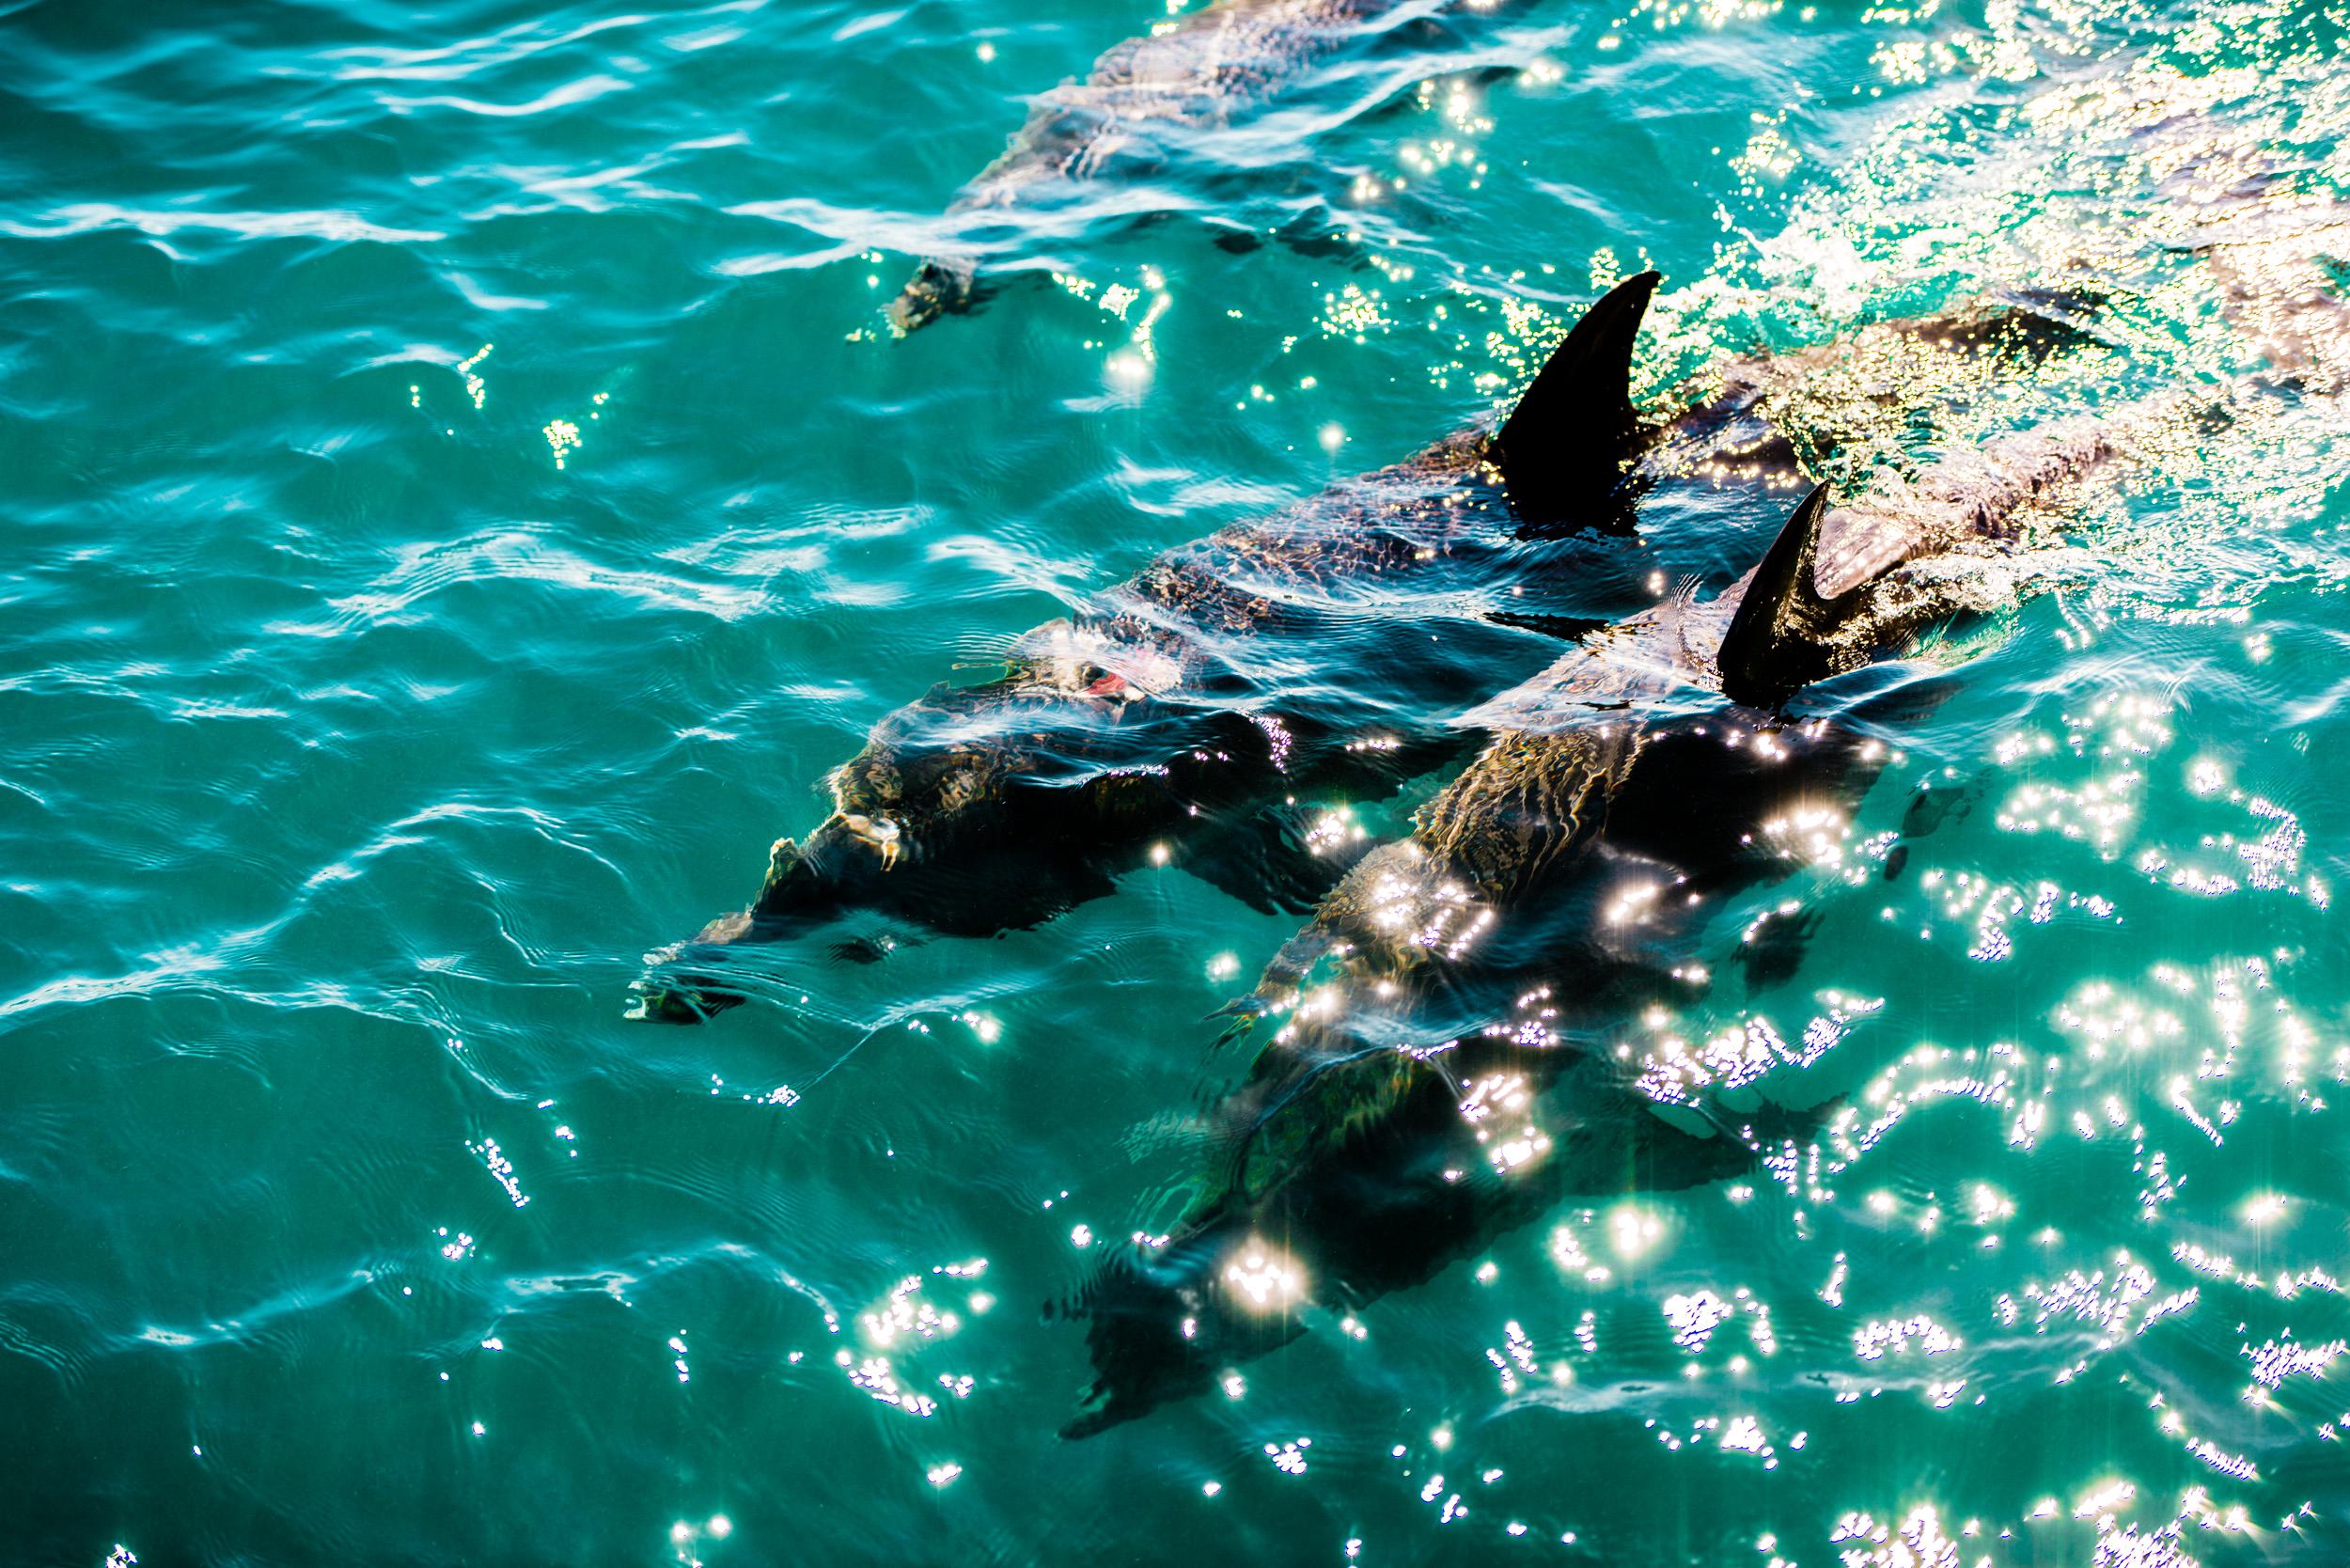 Spyrides_Kyle_Dolphin_Swimming_Rockingham_DSC2821.jpg